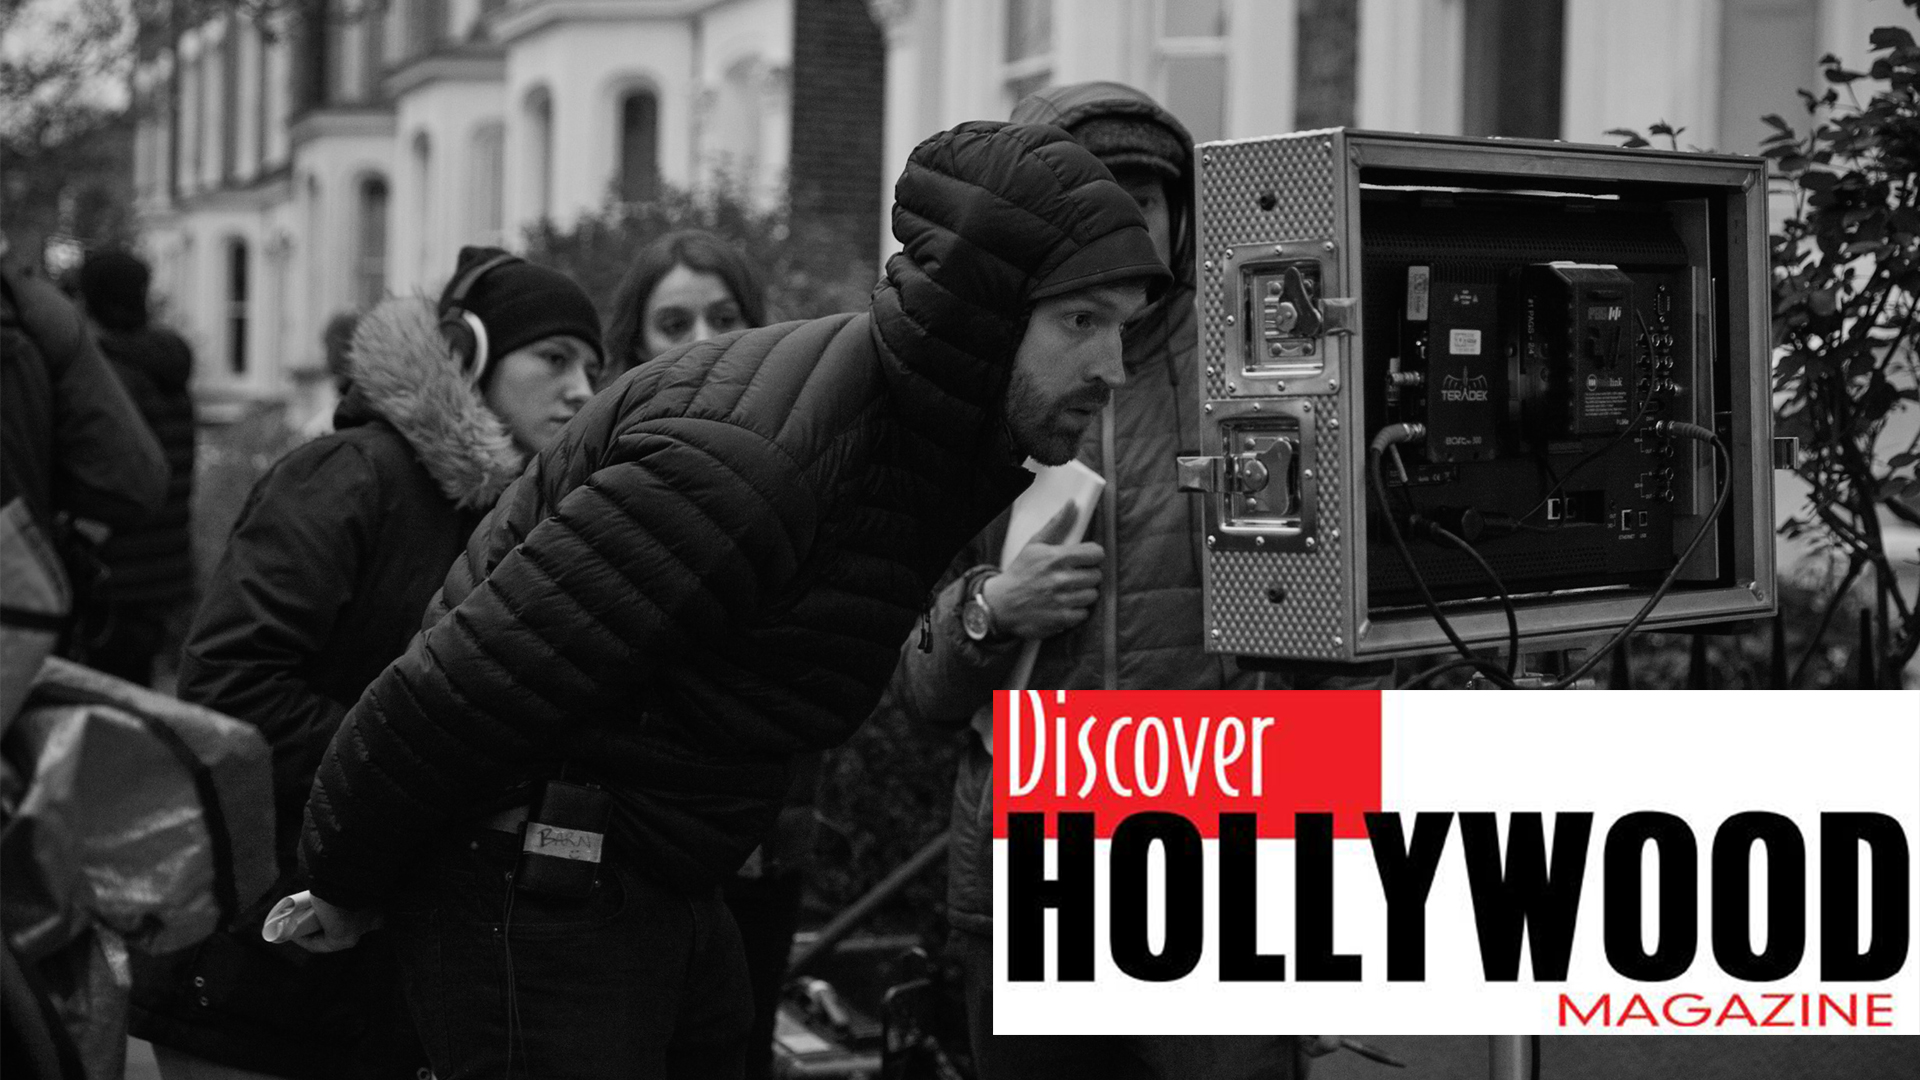 discoverhollywoodweb.jpg